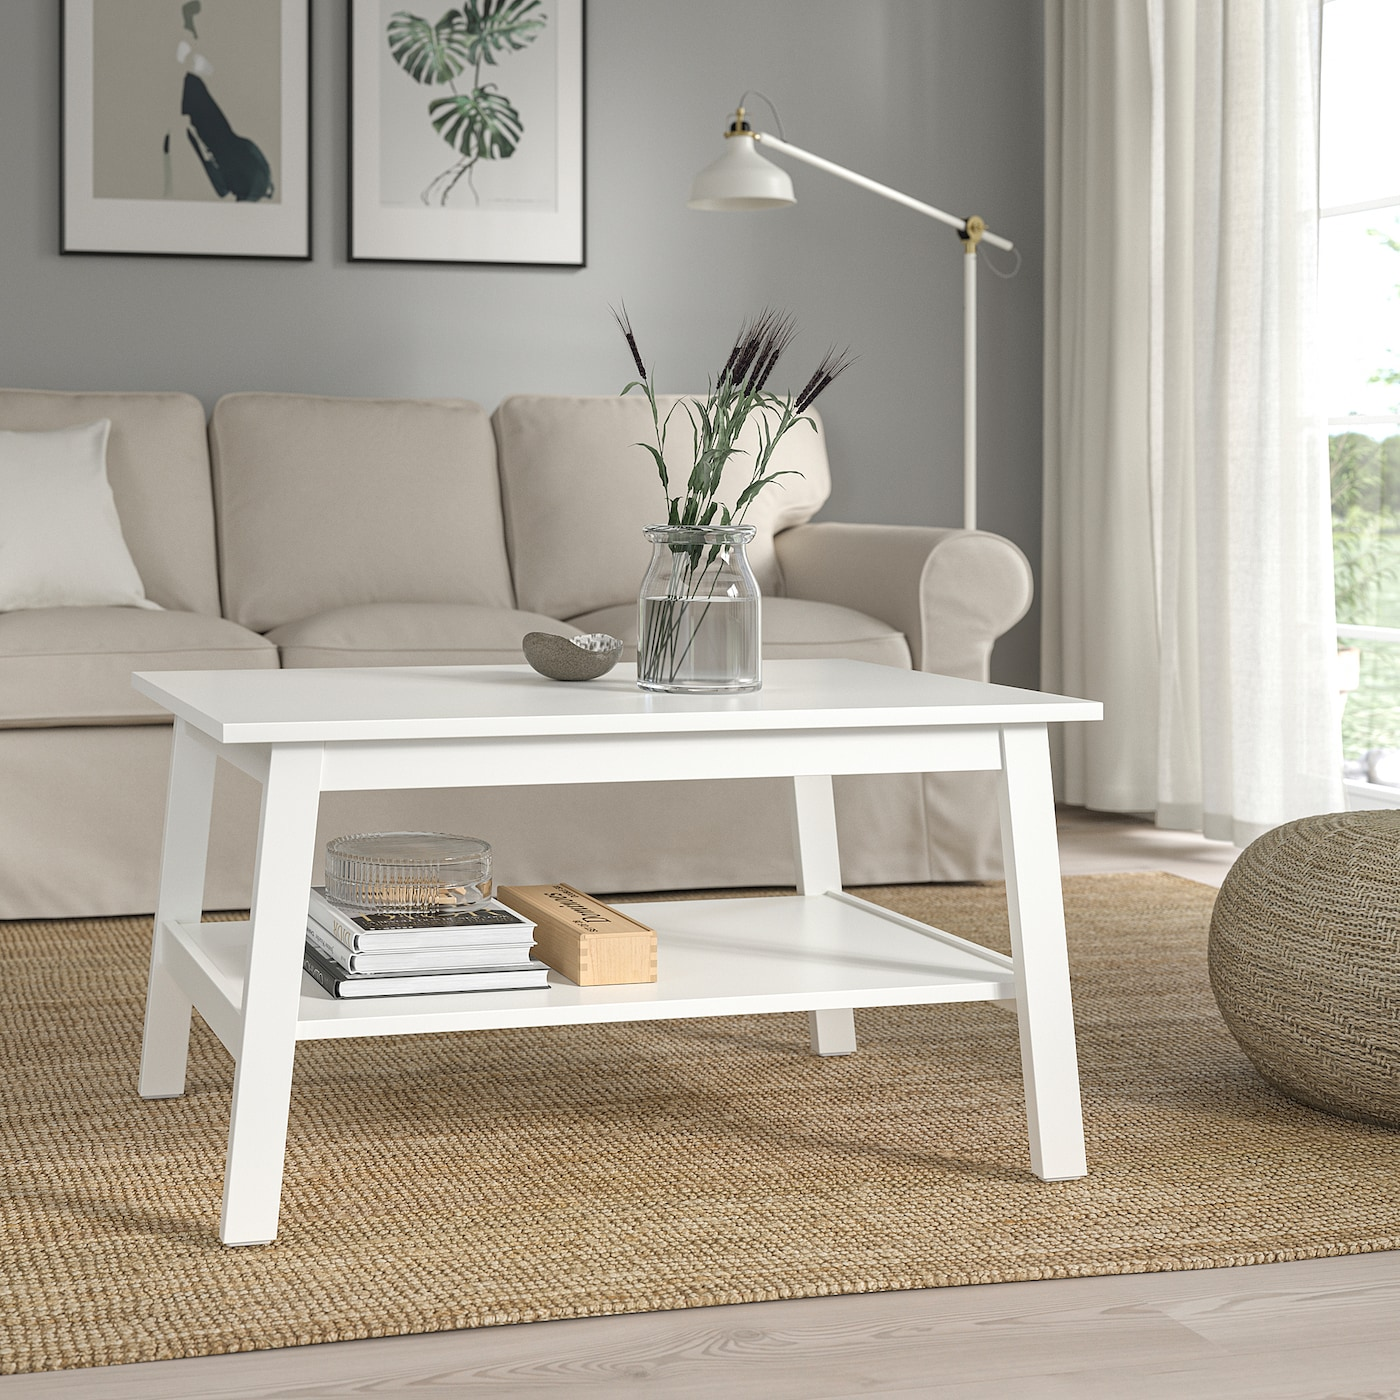 Lunnarp Coffee Table White 90x55 Cm Ikea Ireland [ 1400 x 1400 Pixel ]